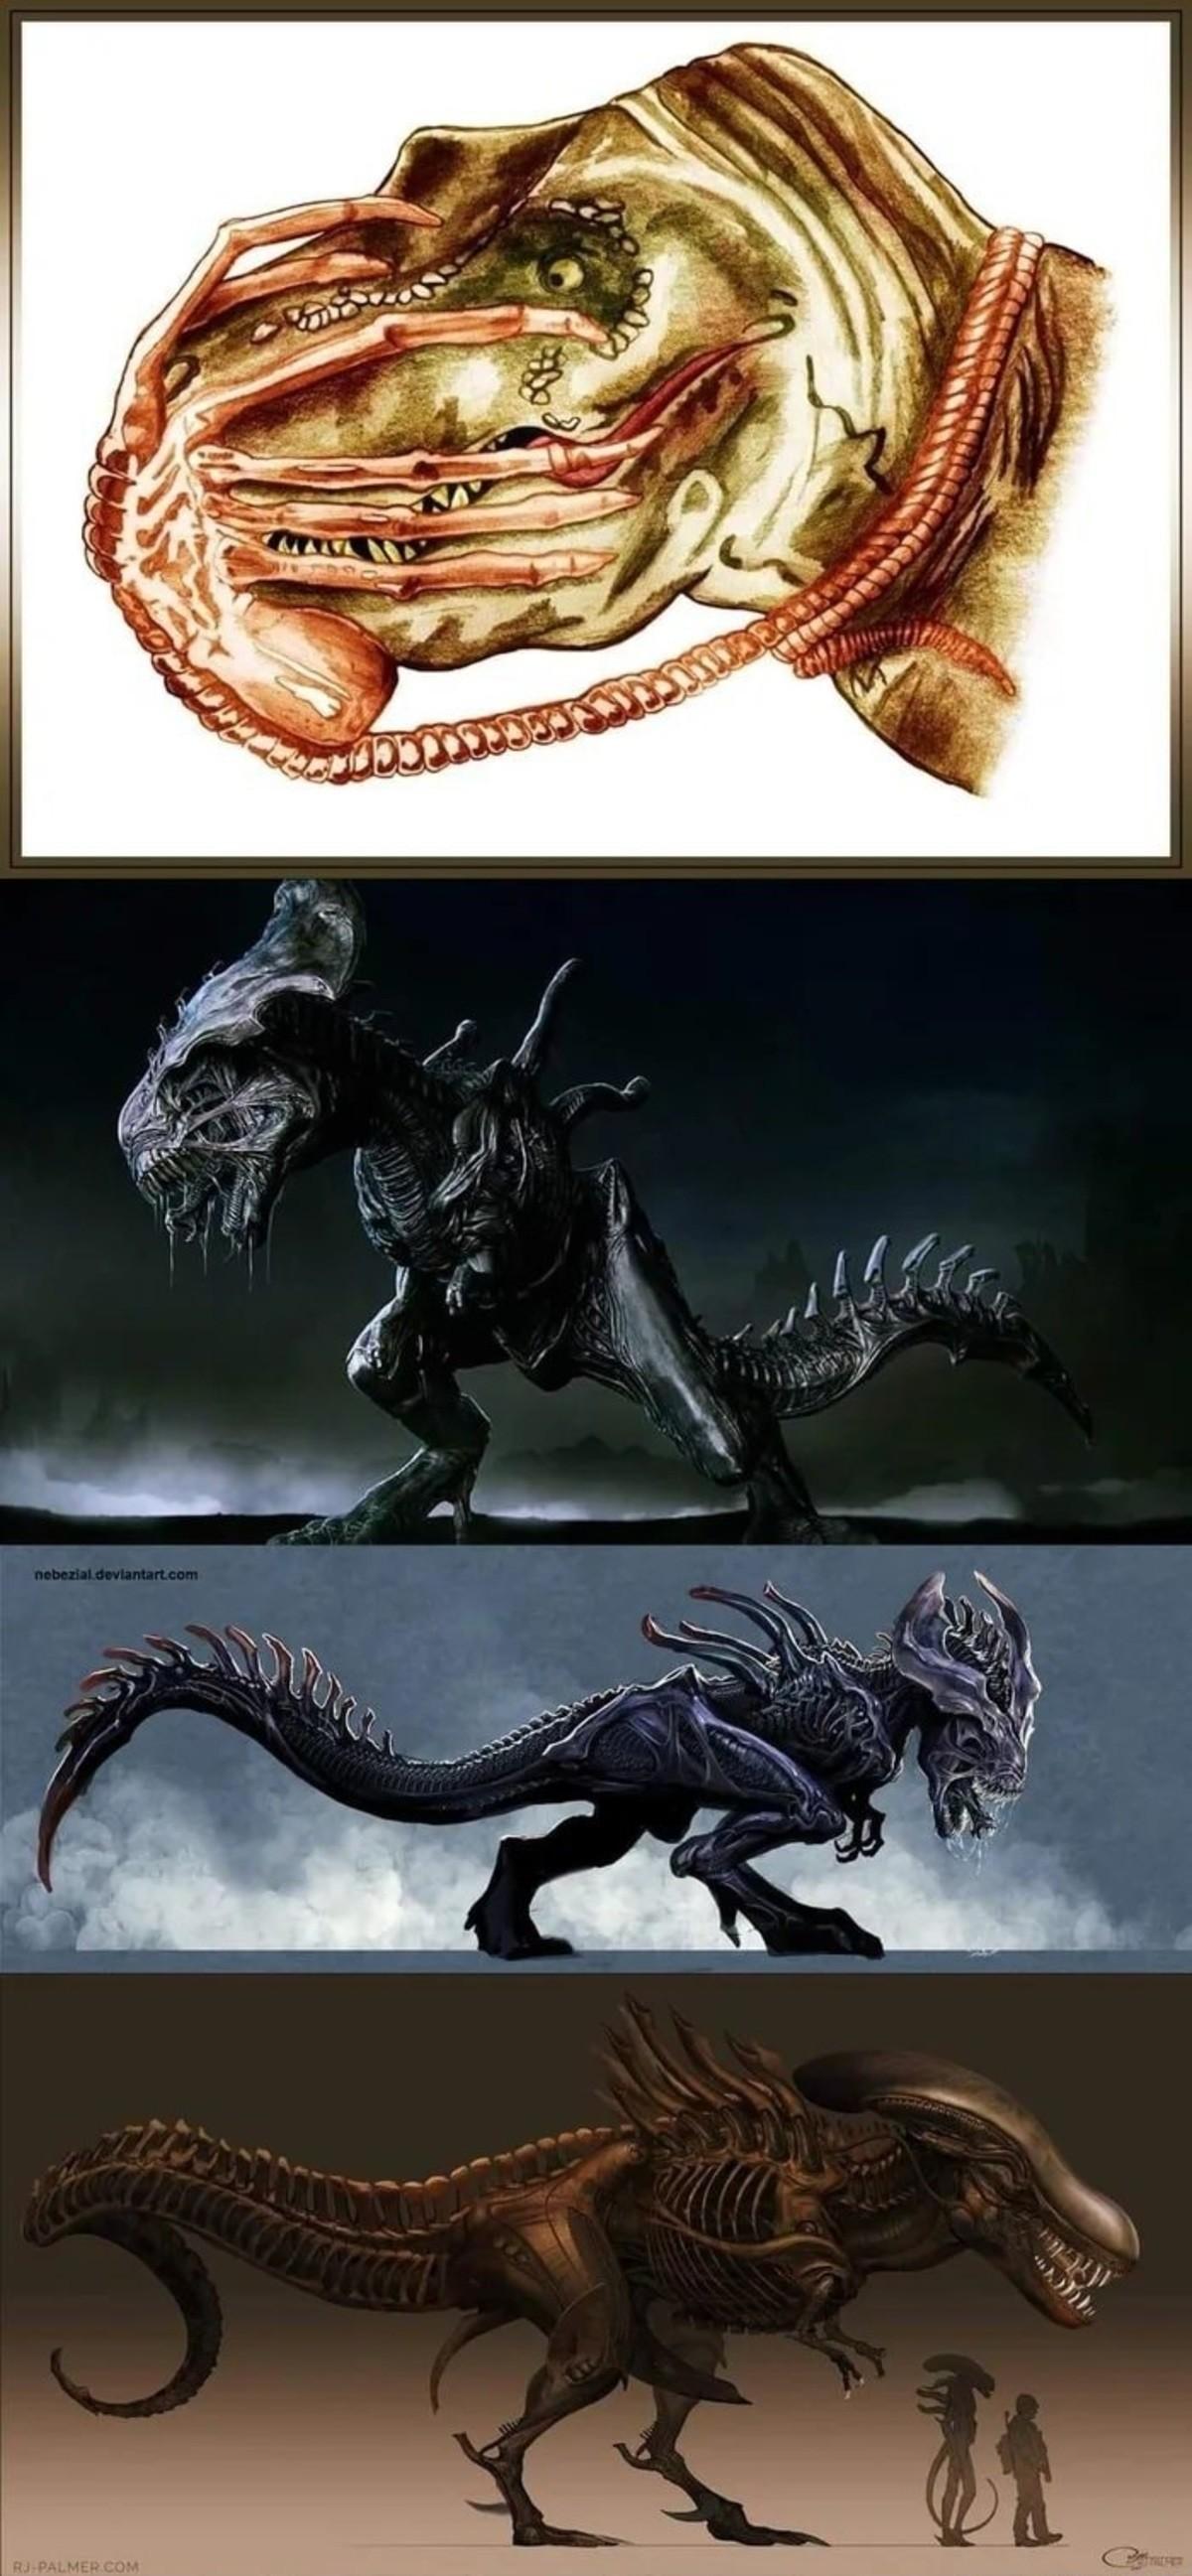 Xenomorphosaurus. .. Thank you for the accurate giant alien schlong